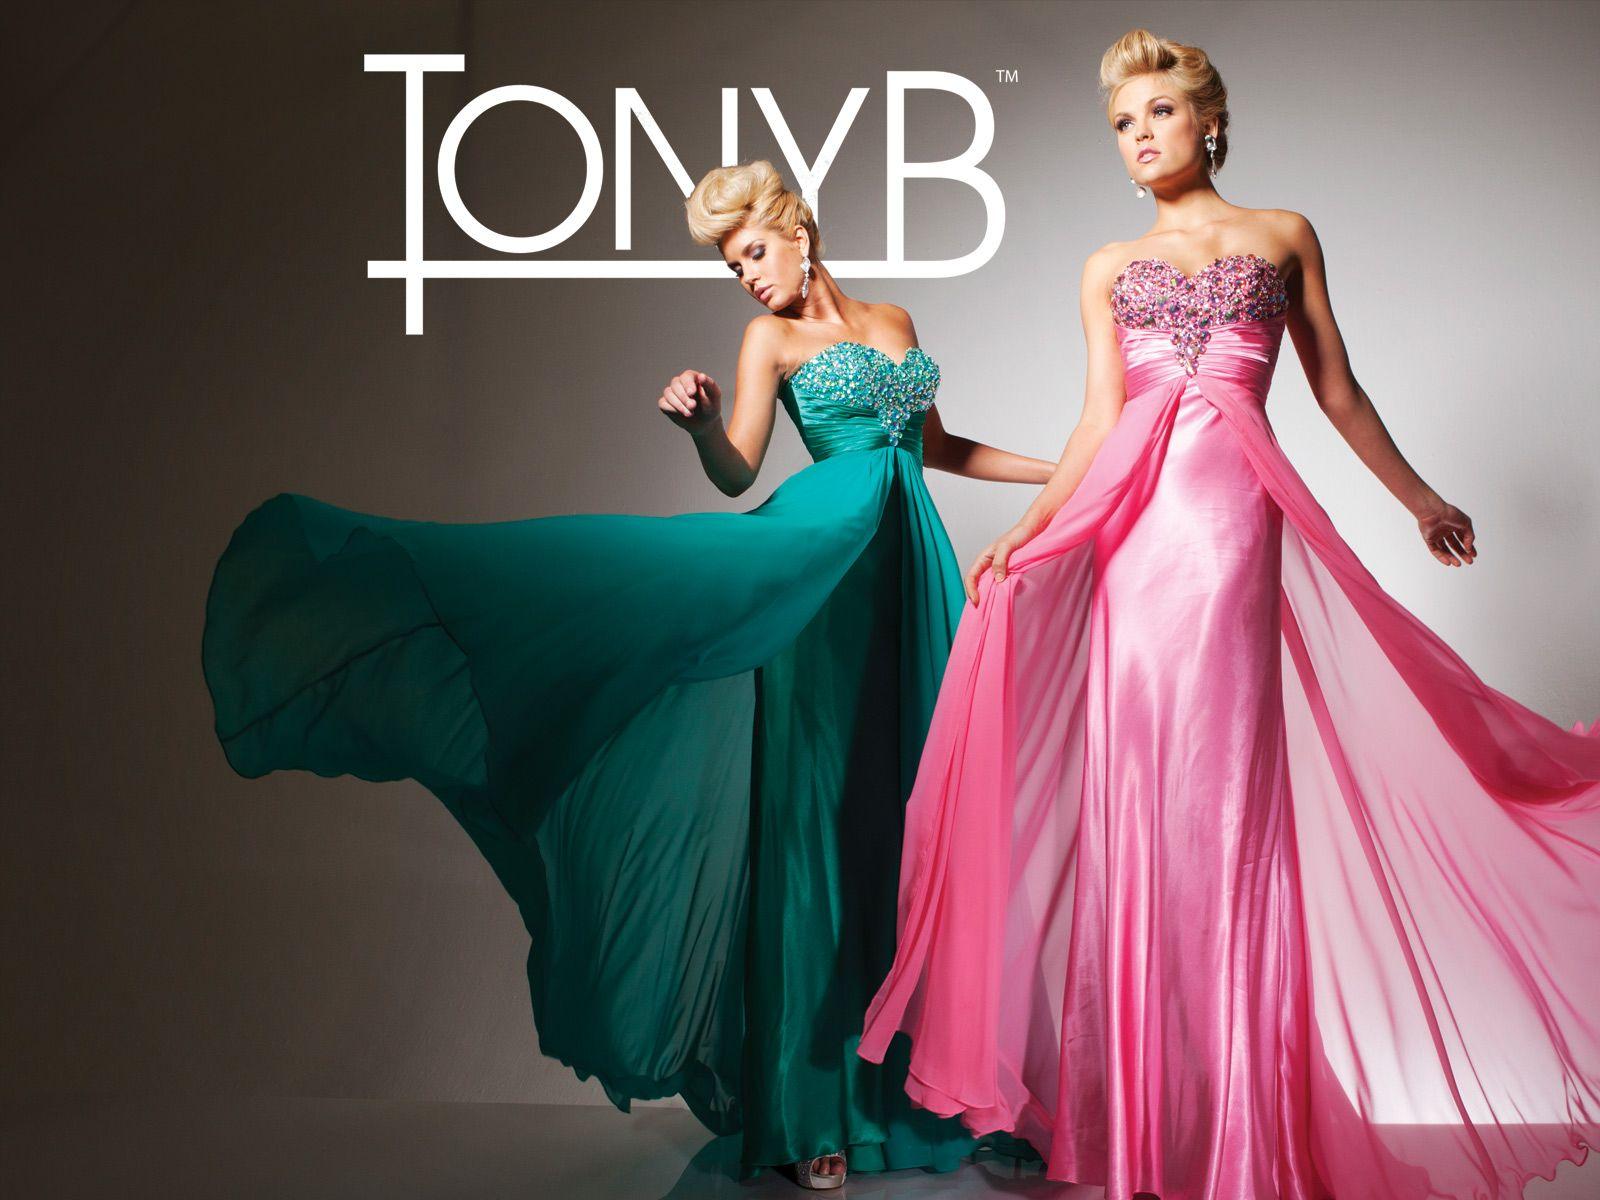 Strapless velvet chiffon prom dress with handbeaded bodice and